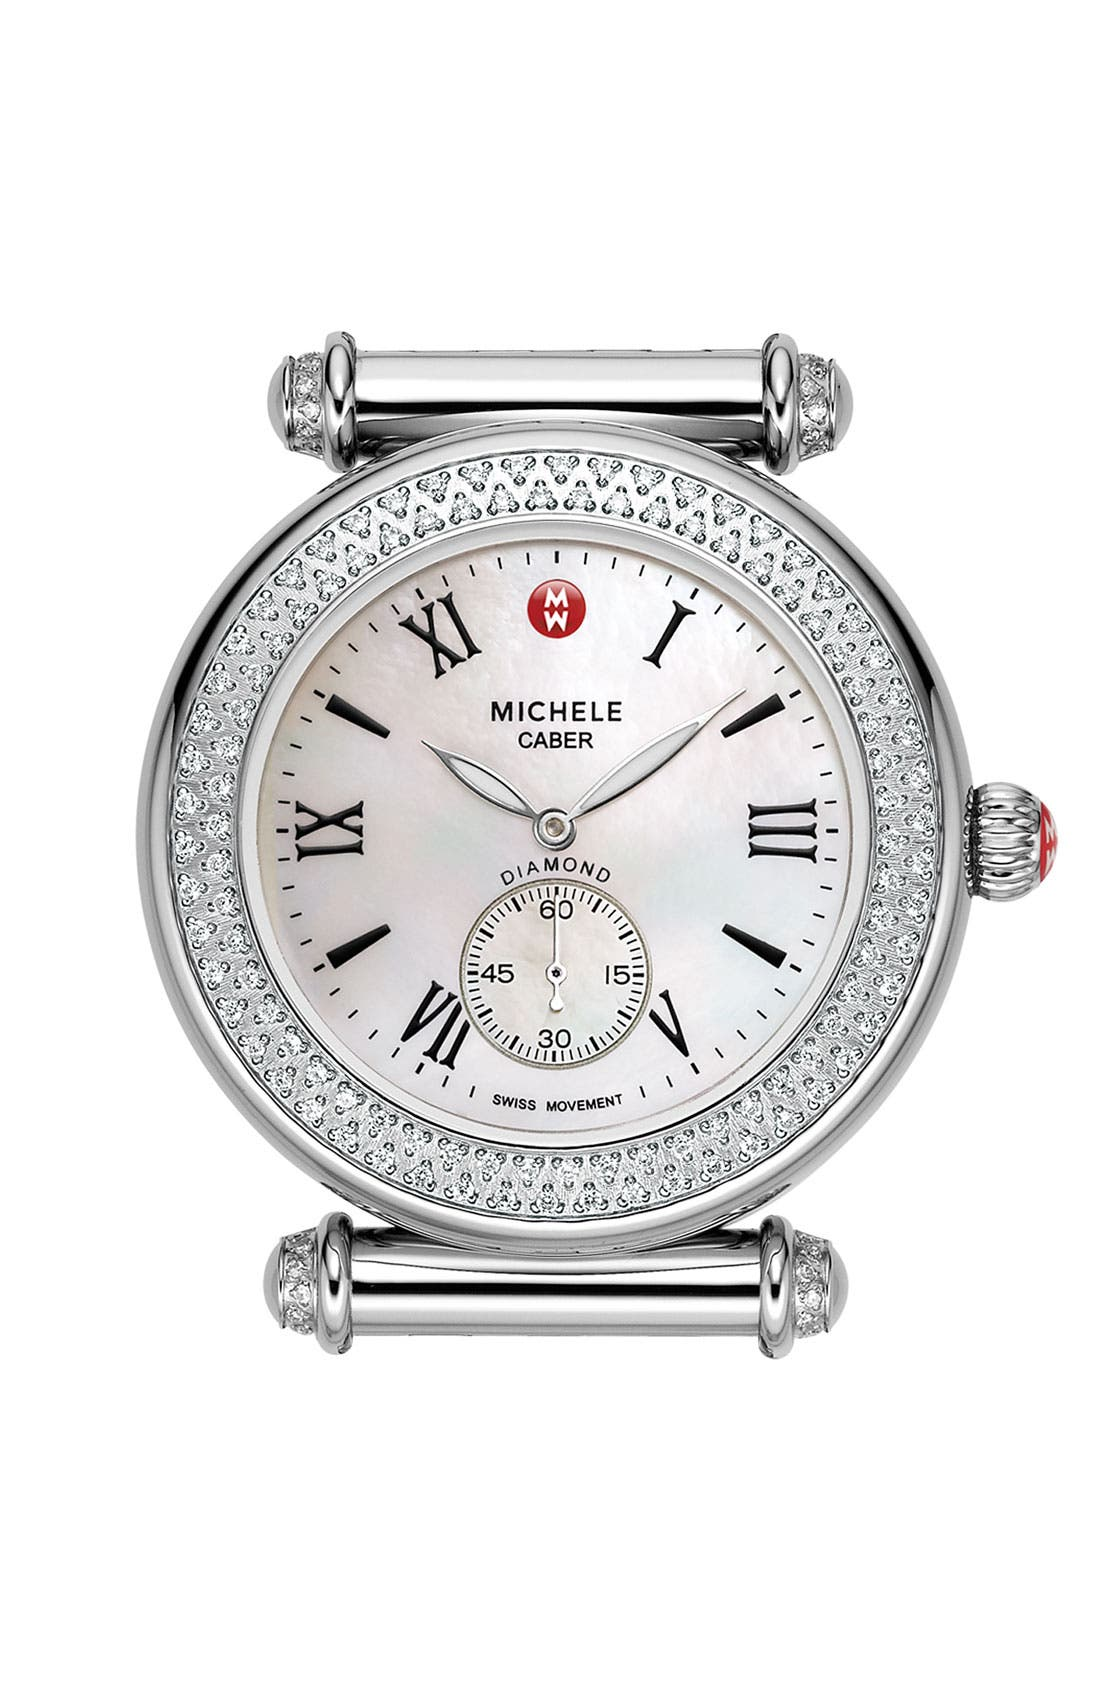 Main Image - MICHELE 'Caber' Diamond Gold Watch Case, 38mm